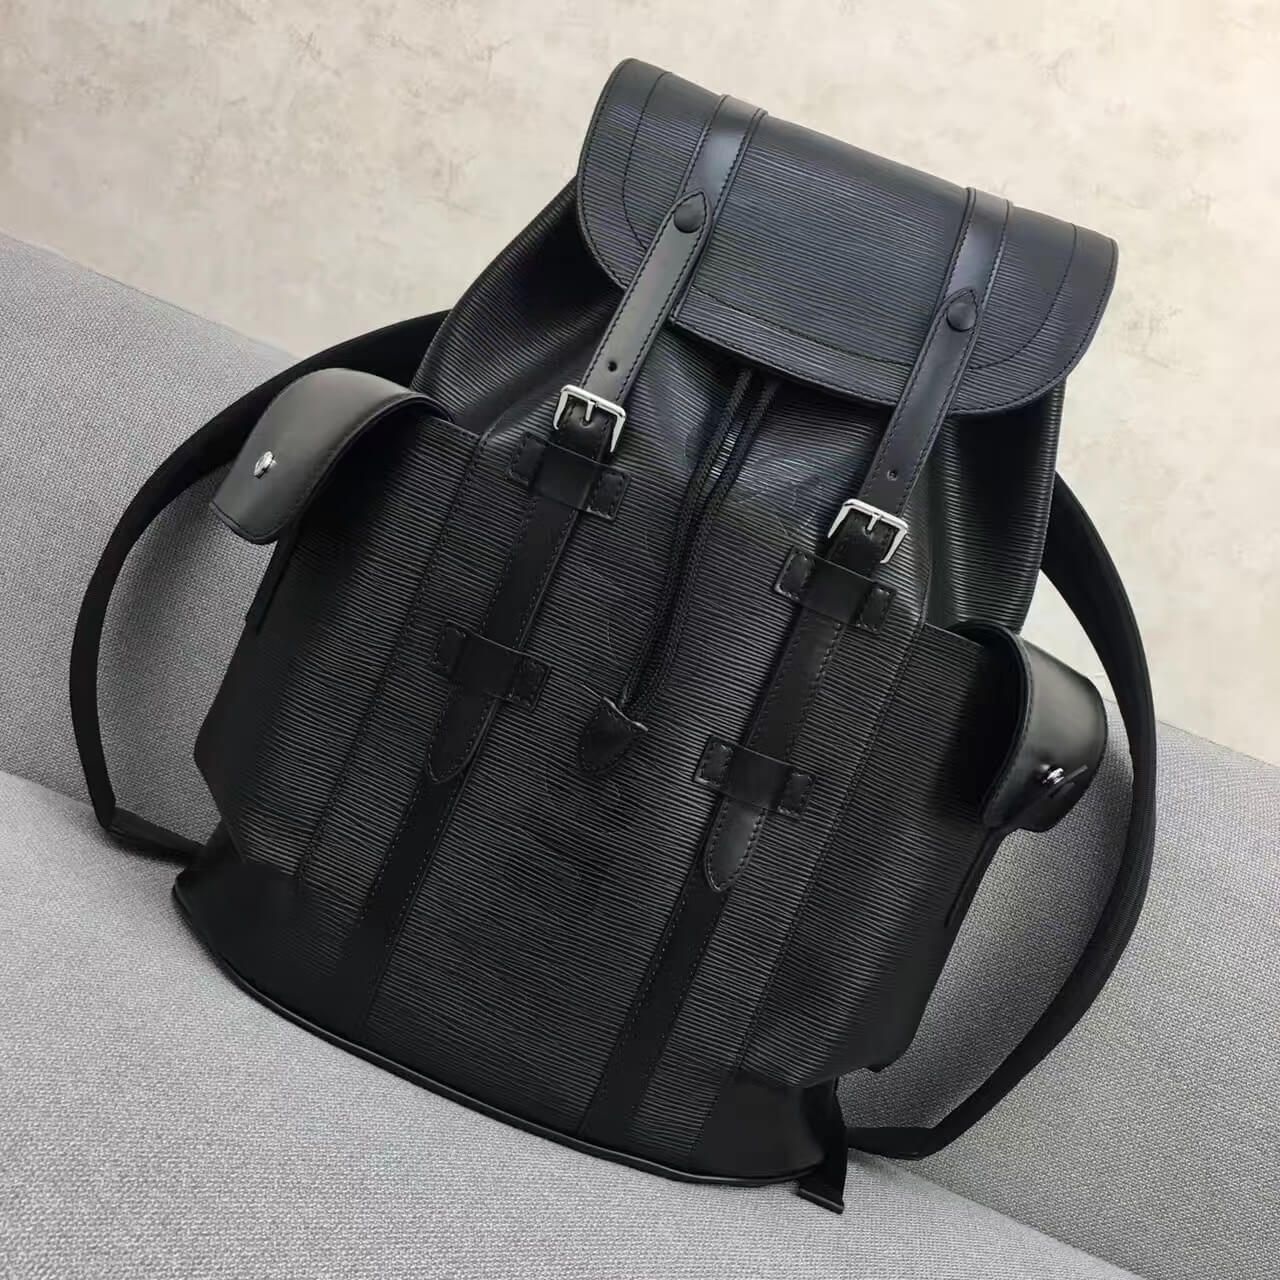 98399d6dc8c4 Louis Vuitton x Supreme Epi Leather Christopher PM Backpack 2017 ...